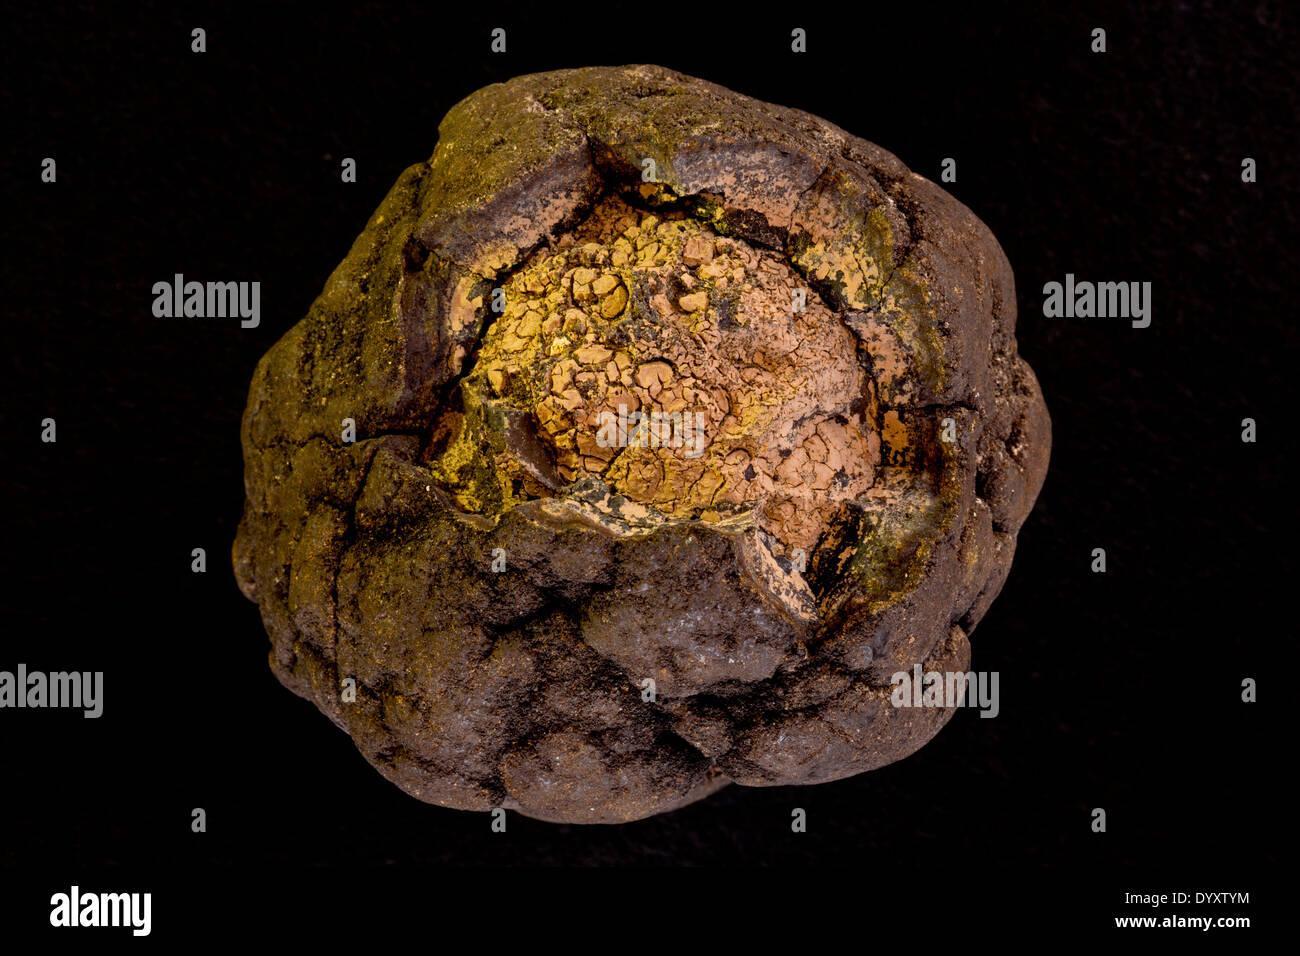 Polymetalic deep sea nodule, cross-section, Manganese and cobalt rich, From 800 meters depth form Blake plateau Atlantic ocean - Stock Image